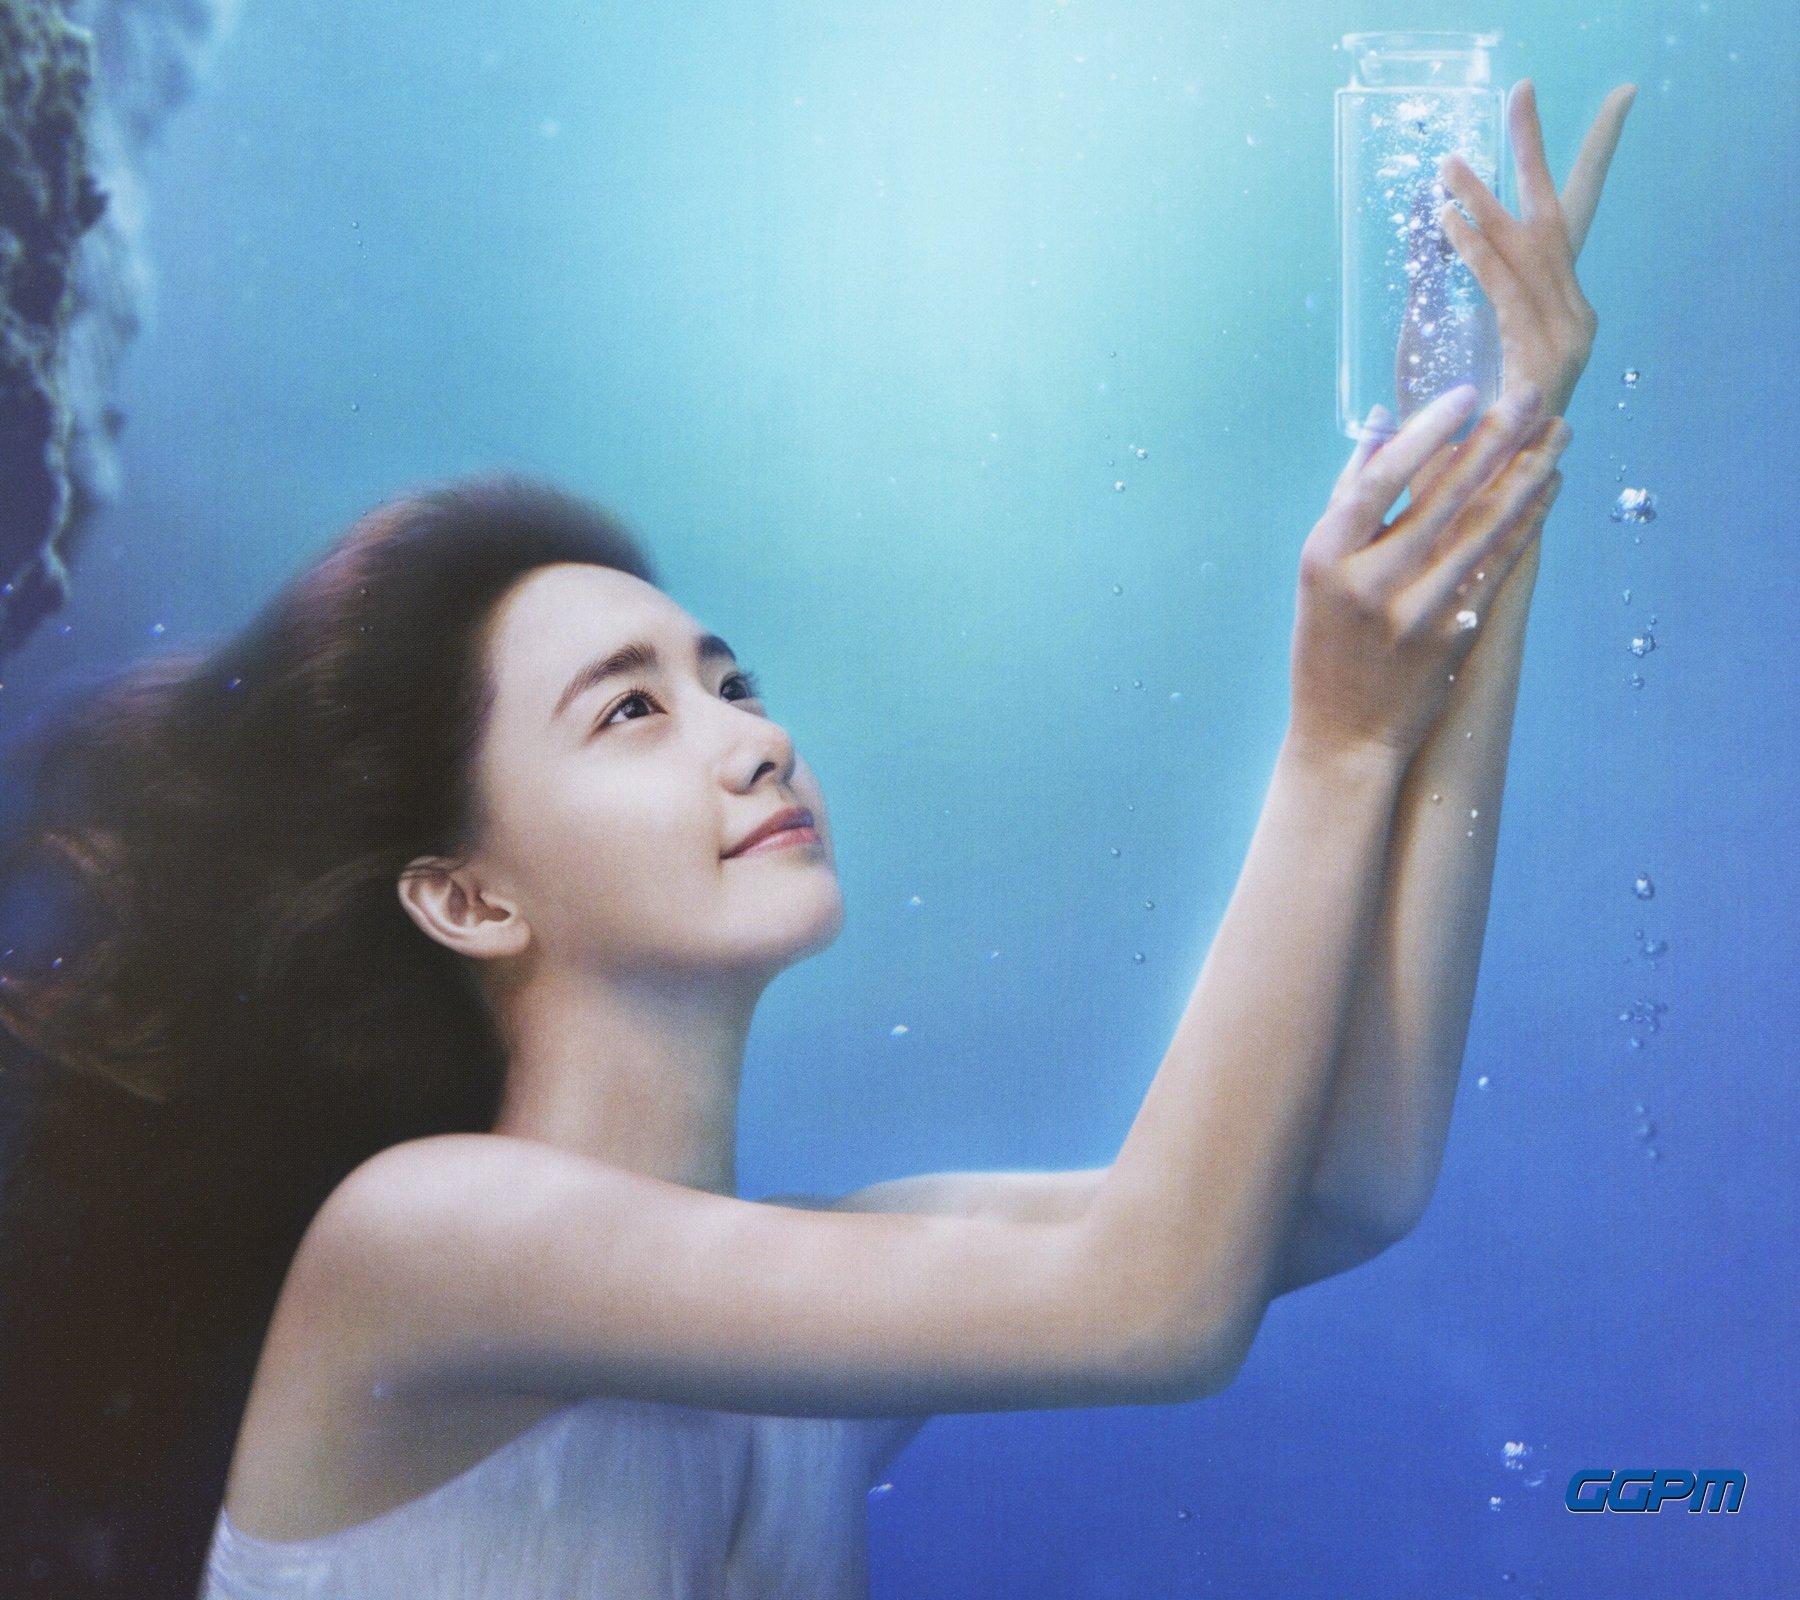 Girls' Generation Yoona - Magazine cover